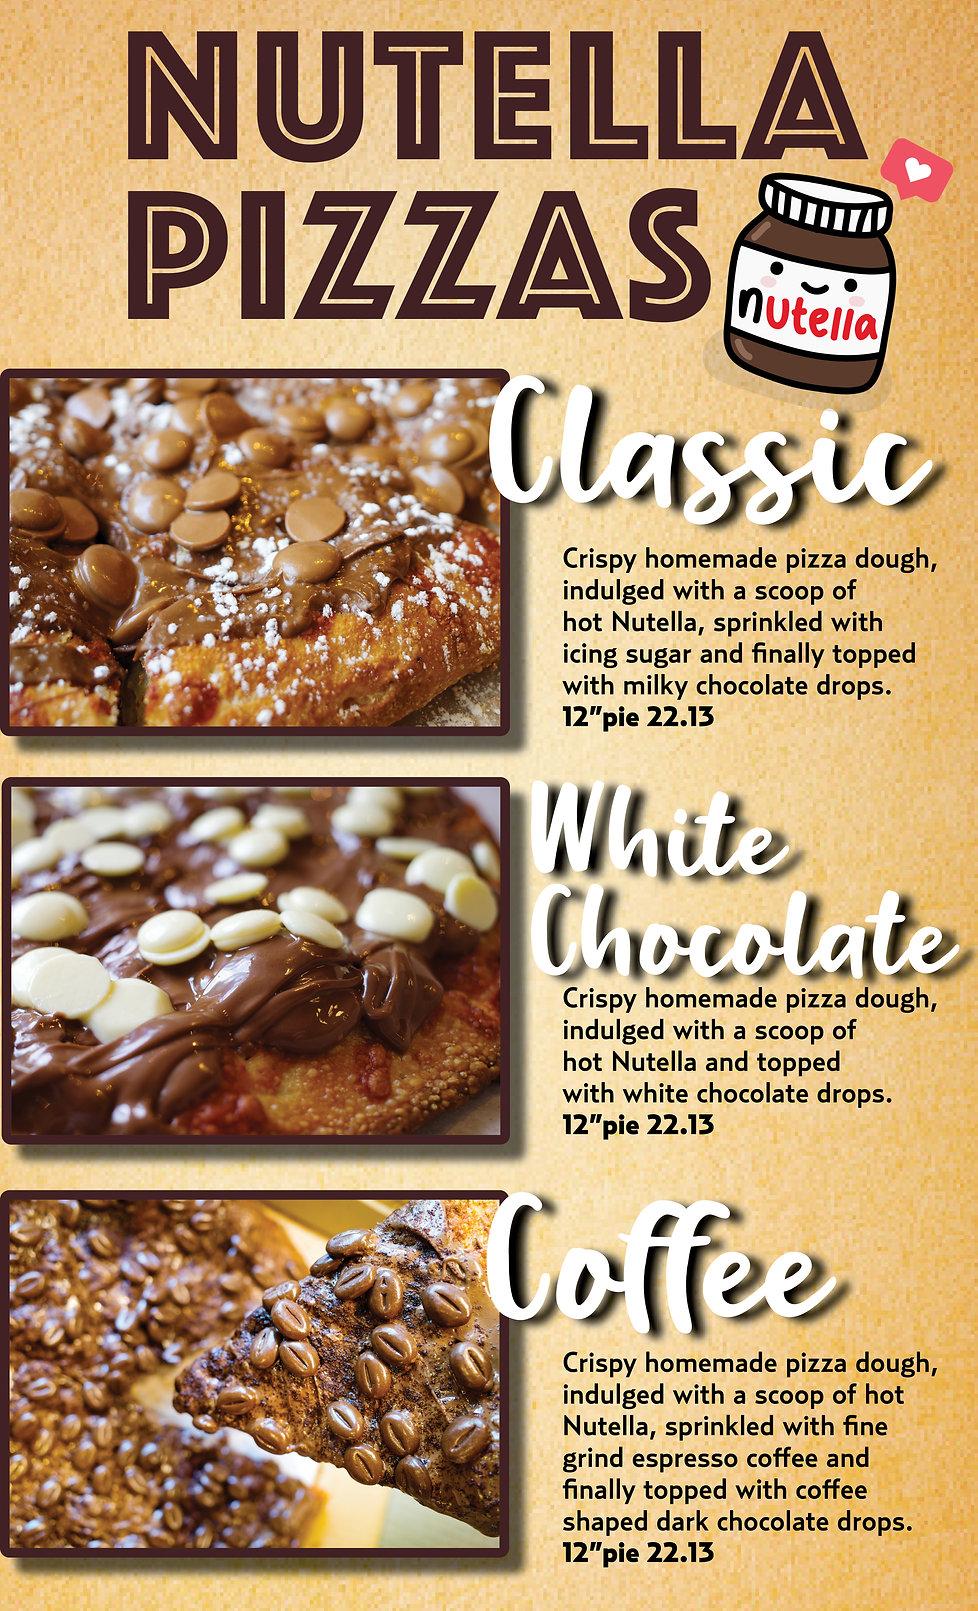 NutellaPizzas.jpg